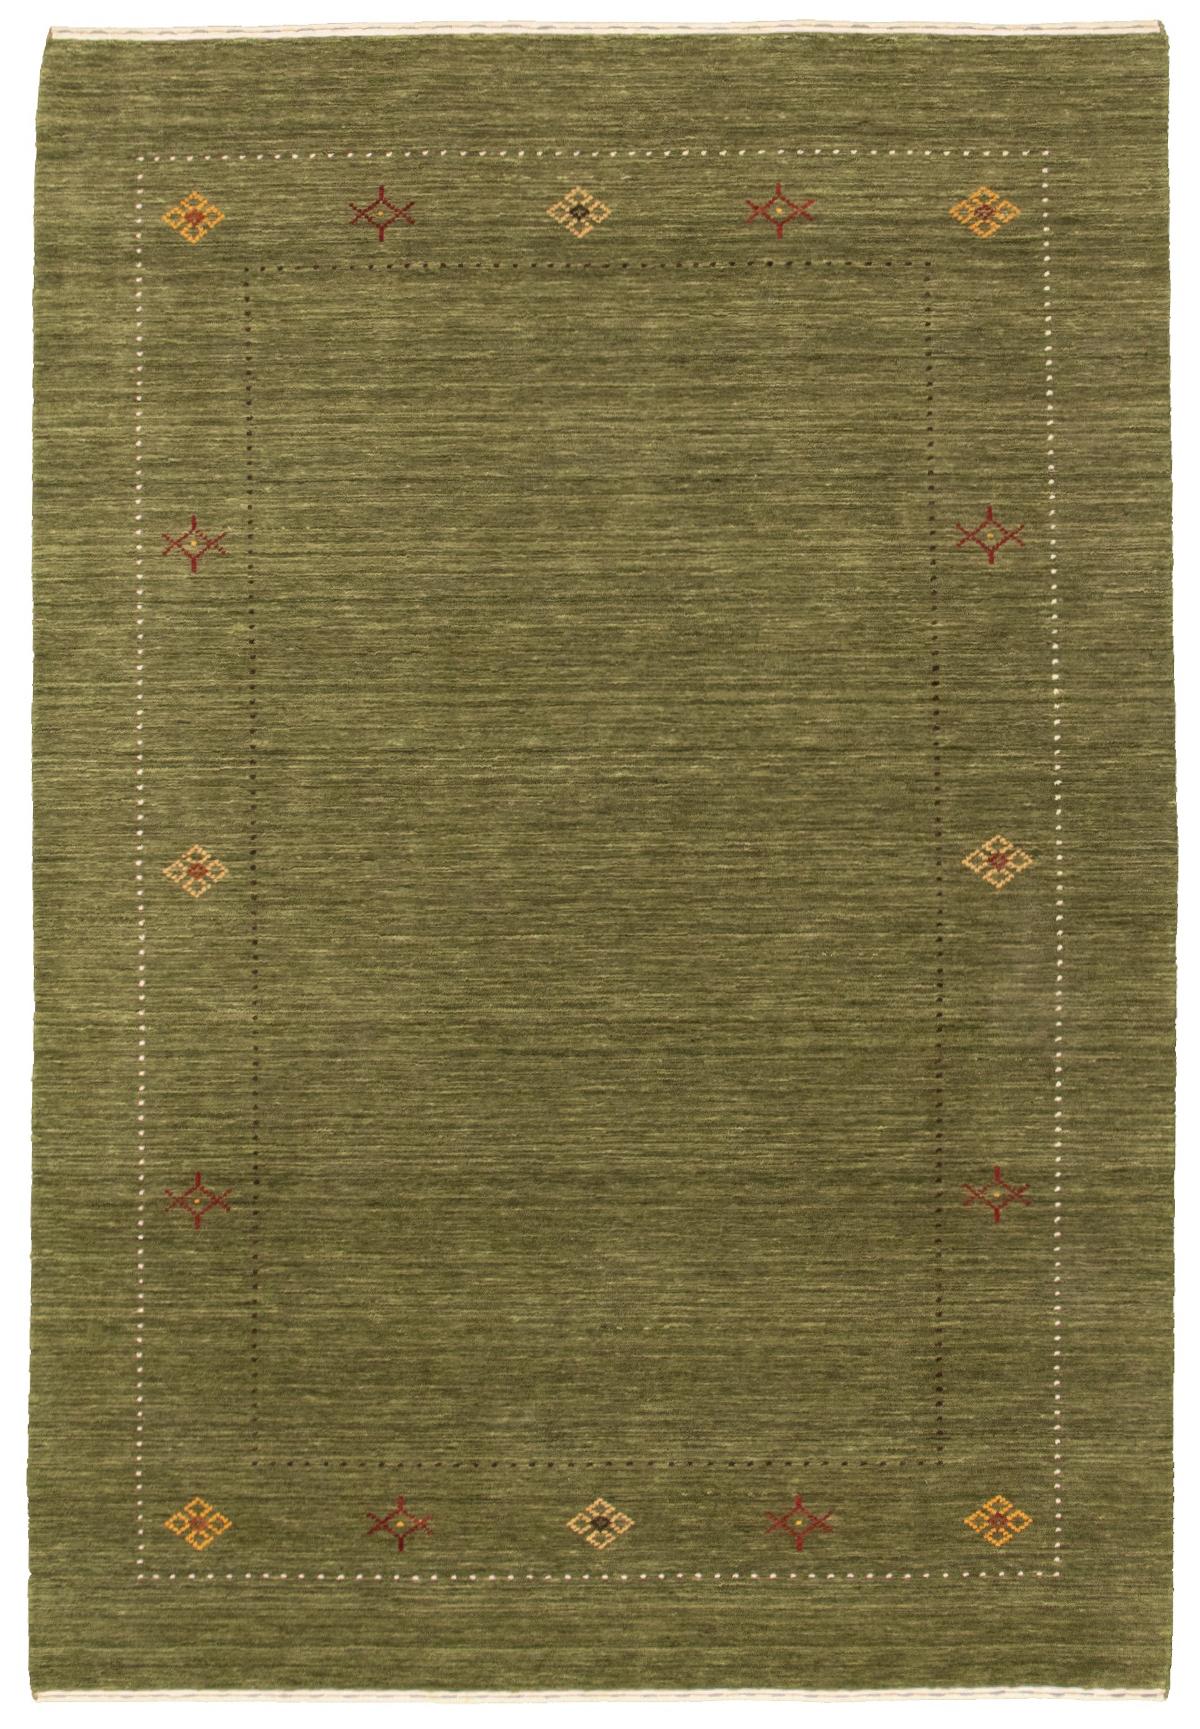 "Hand-knotted Kashkuli Gabbeh Green Wool Rug 5'2"" x 7'8"" Size: 5'2"" x 7'8"""